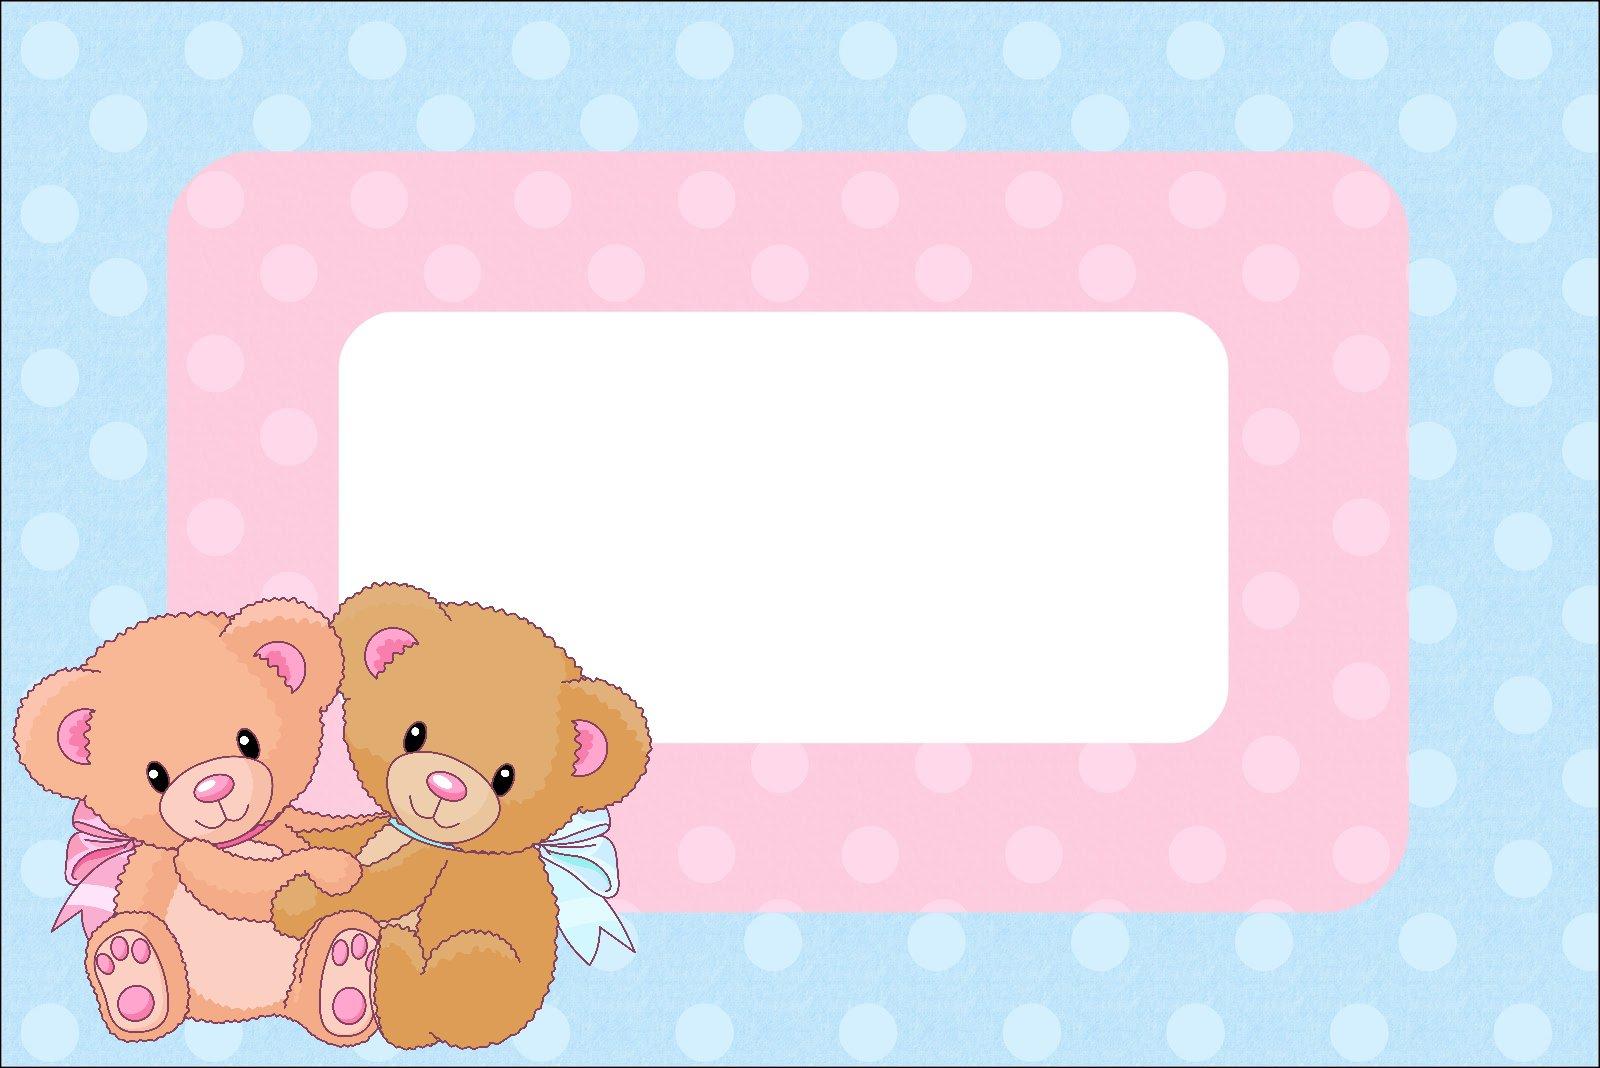 http://2.bp.blogspot.com/-E0kWGb8h6qs/UB_ZzStPj0I/AAAAAAAAODc/bwKe3wkVMf0/s1600/1+Convite5.jpg